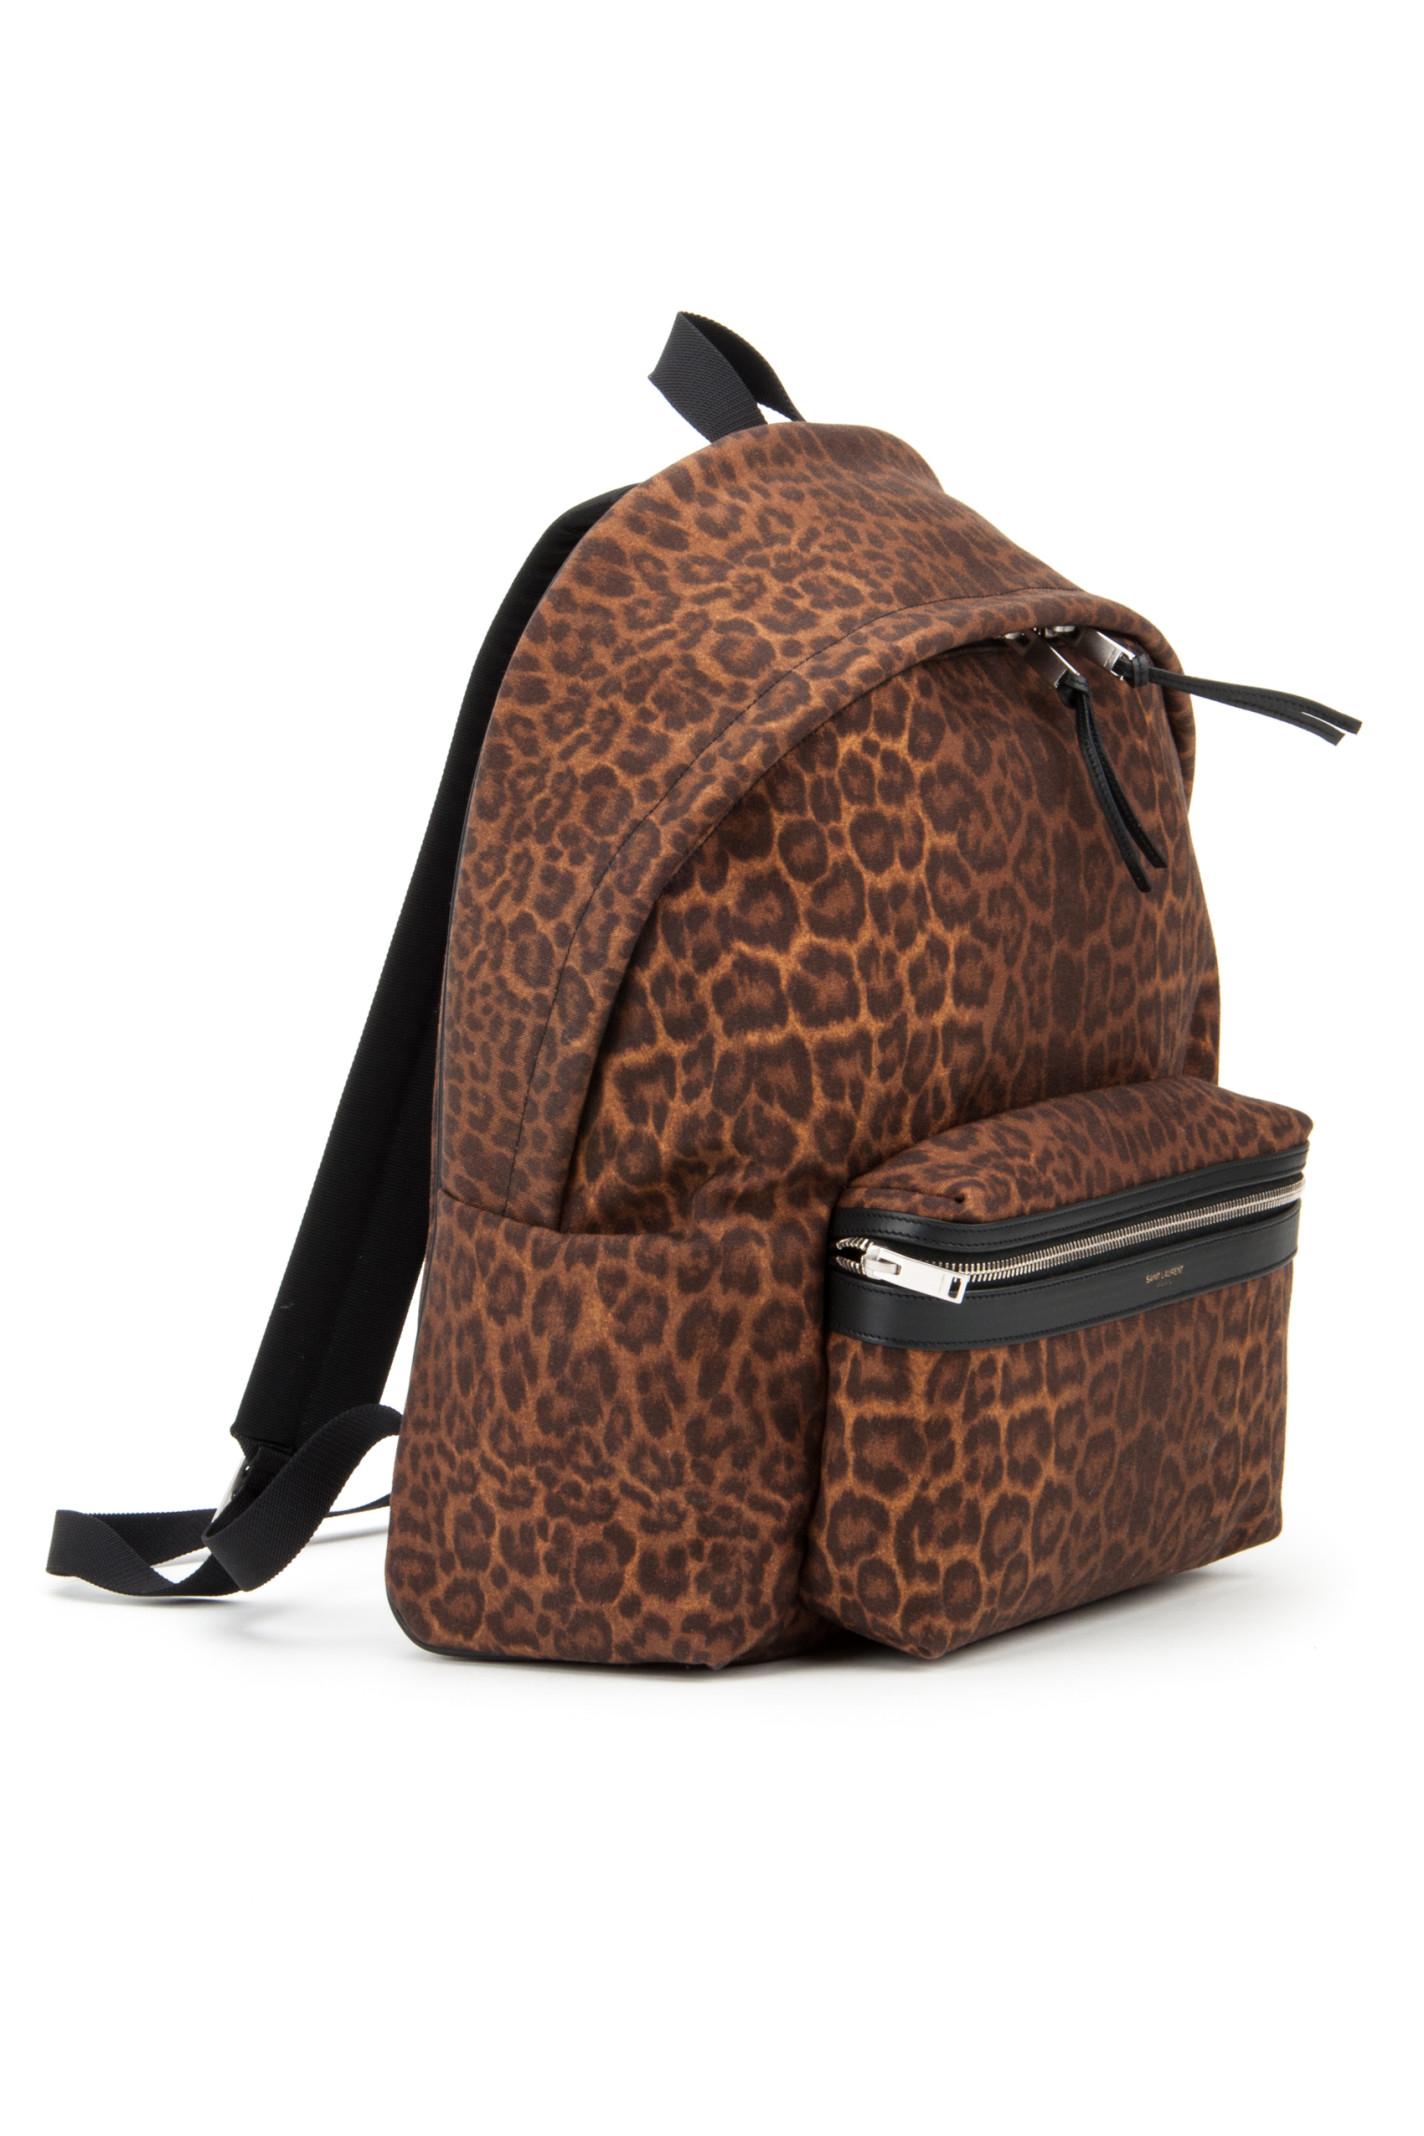 Saint laurent Ysl Hunting Line Backpack in Animal (TAN NERO) | Lyst